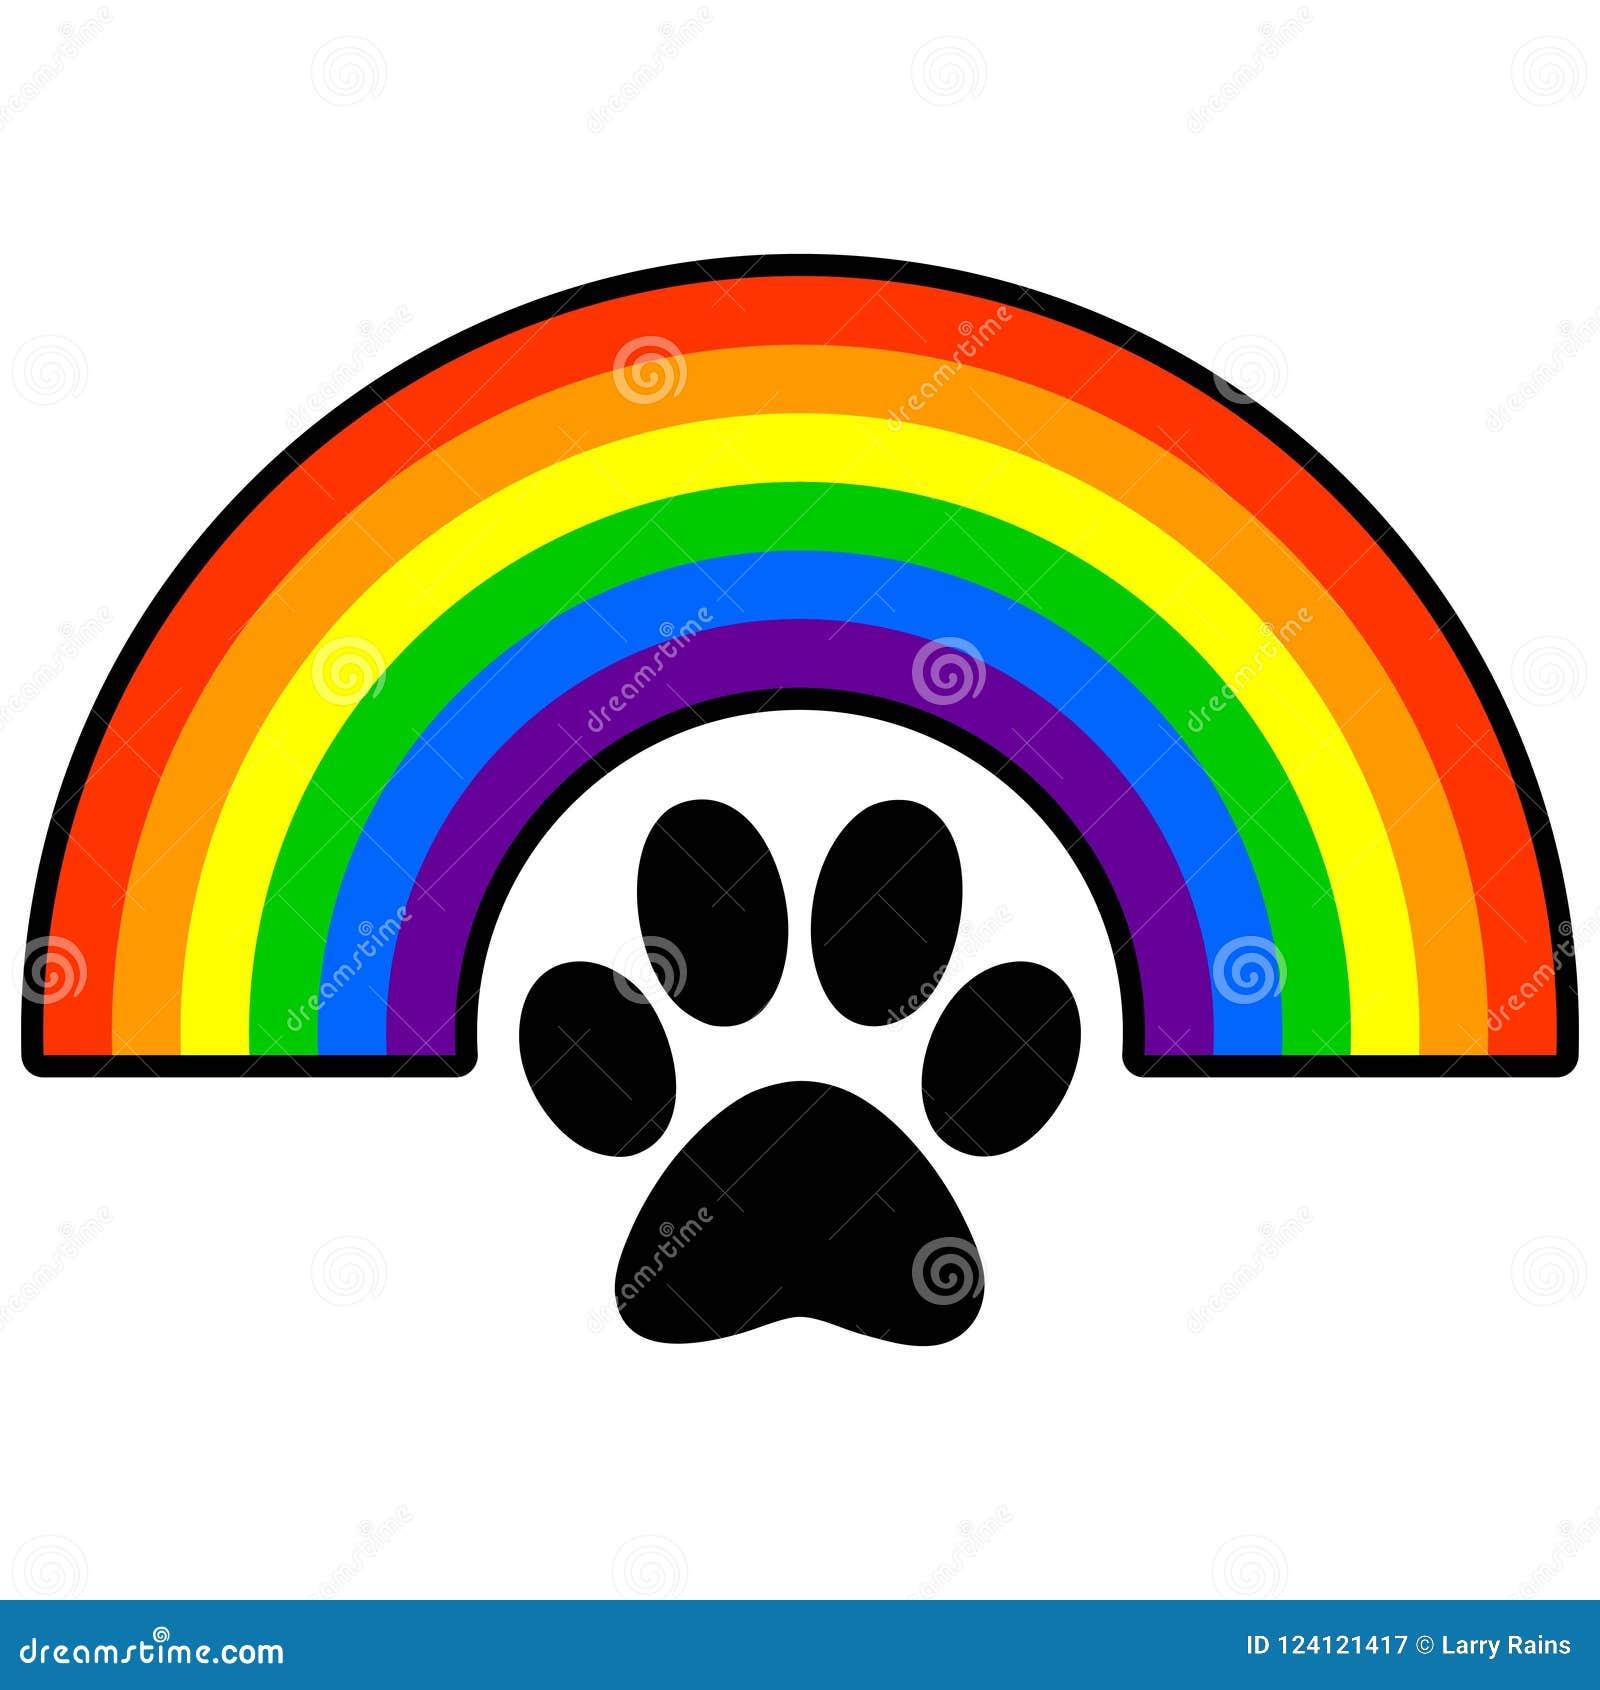 graphic about Rainbow Bridge Printable titled Pet Rainbow Bridge Inventory Examples 8 Canine Rainbow